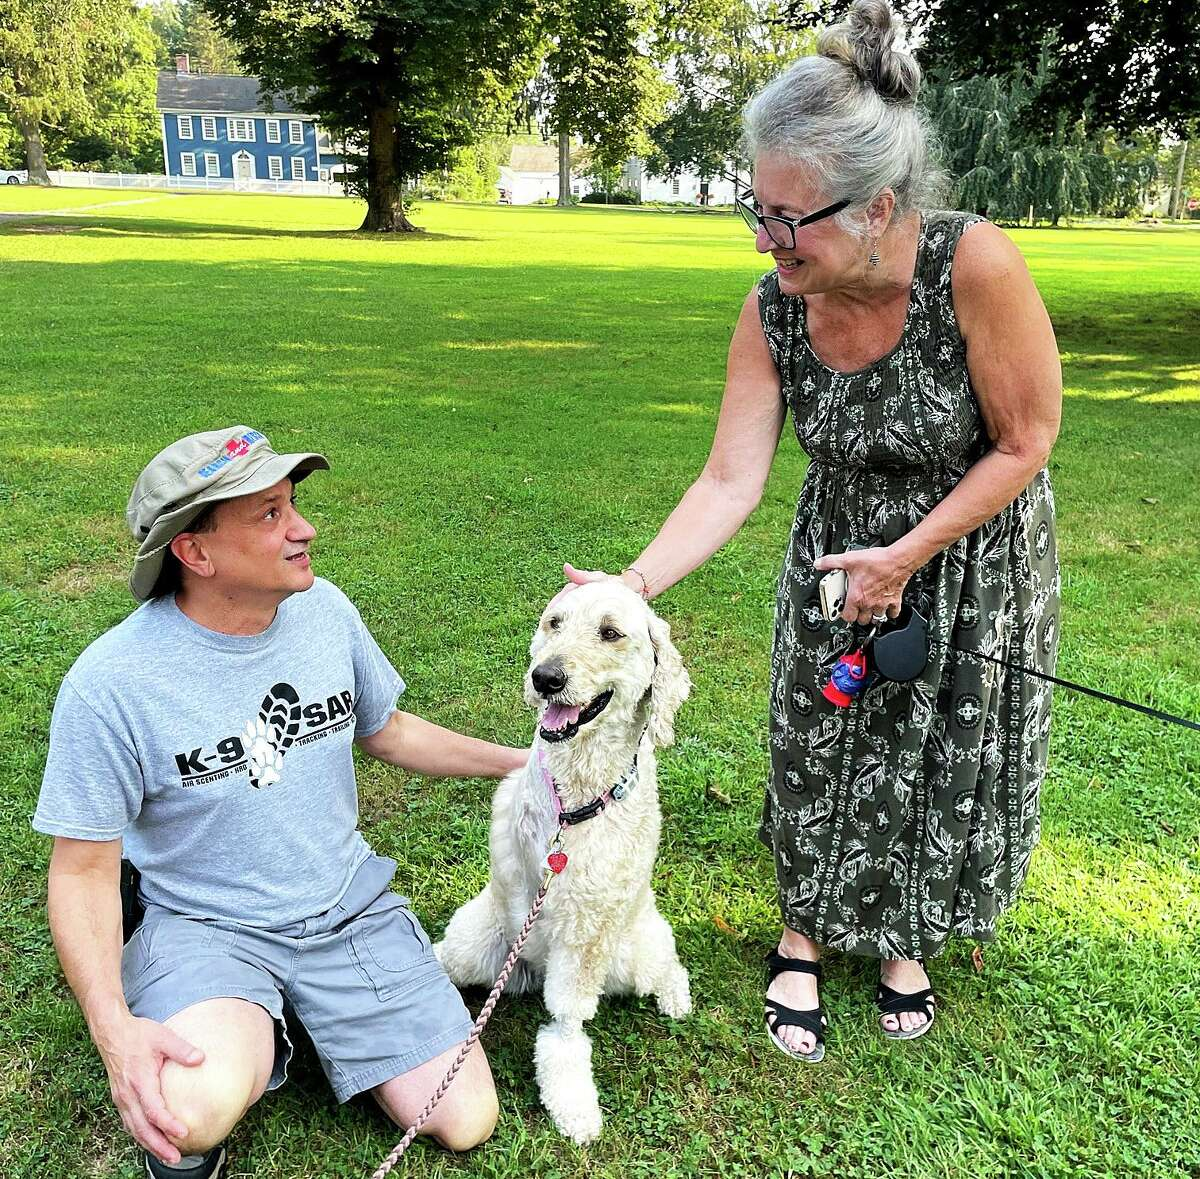 Dan Montuori with Stella and a fan, Debbie Longyear, walking her Shih Tzu, Acacia, on the Madison green.